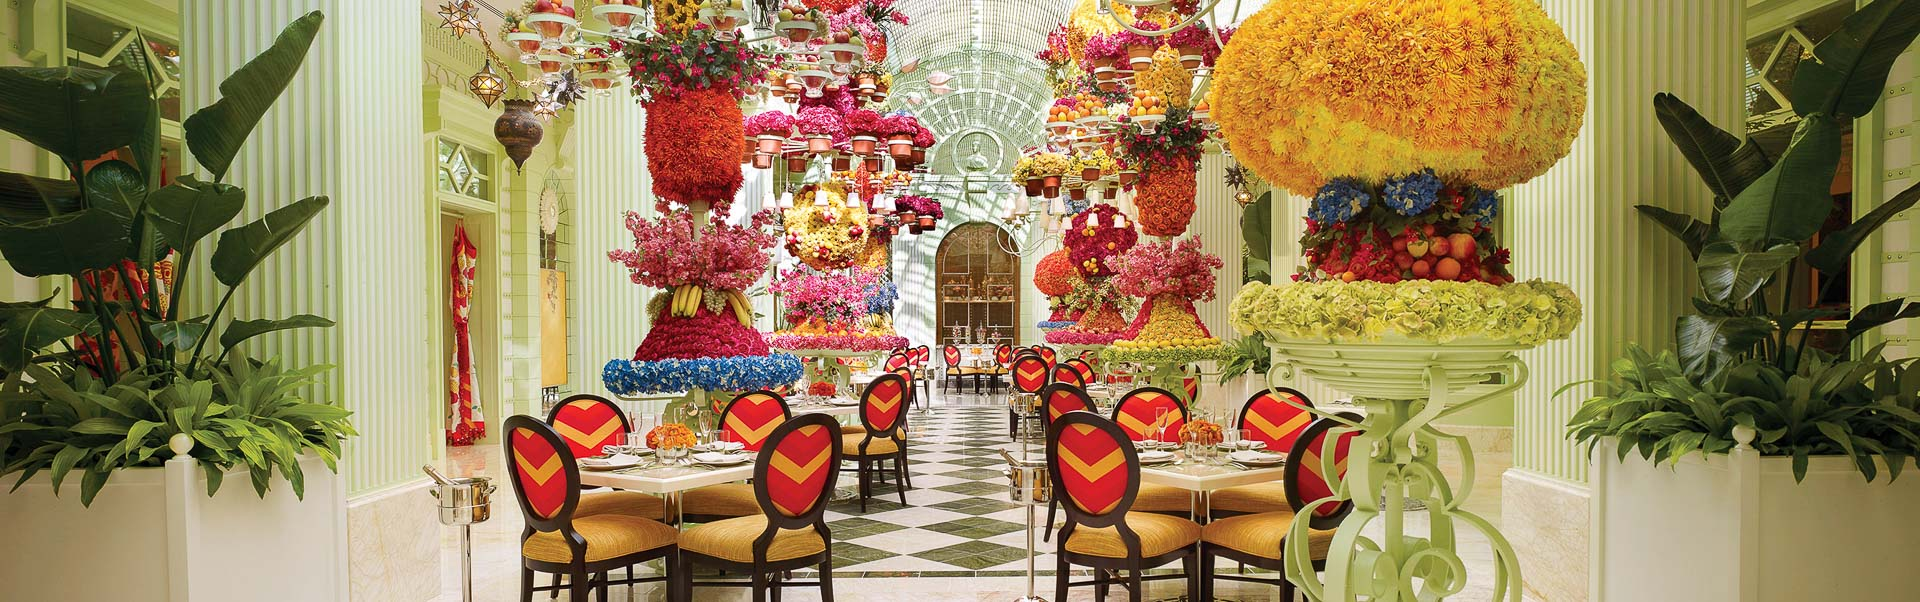 The atrium at The Buffet at Wynn